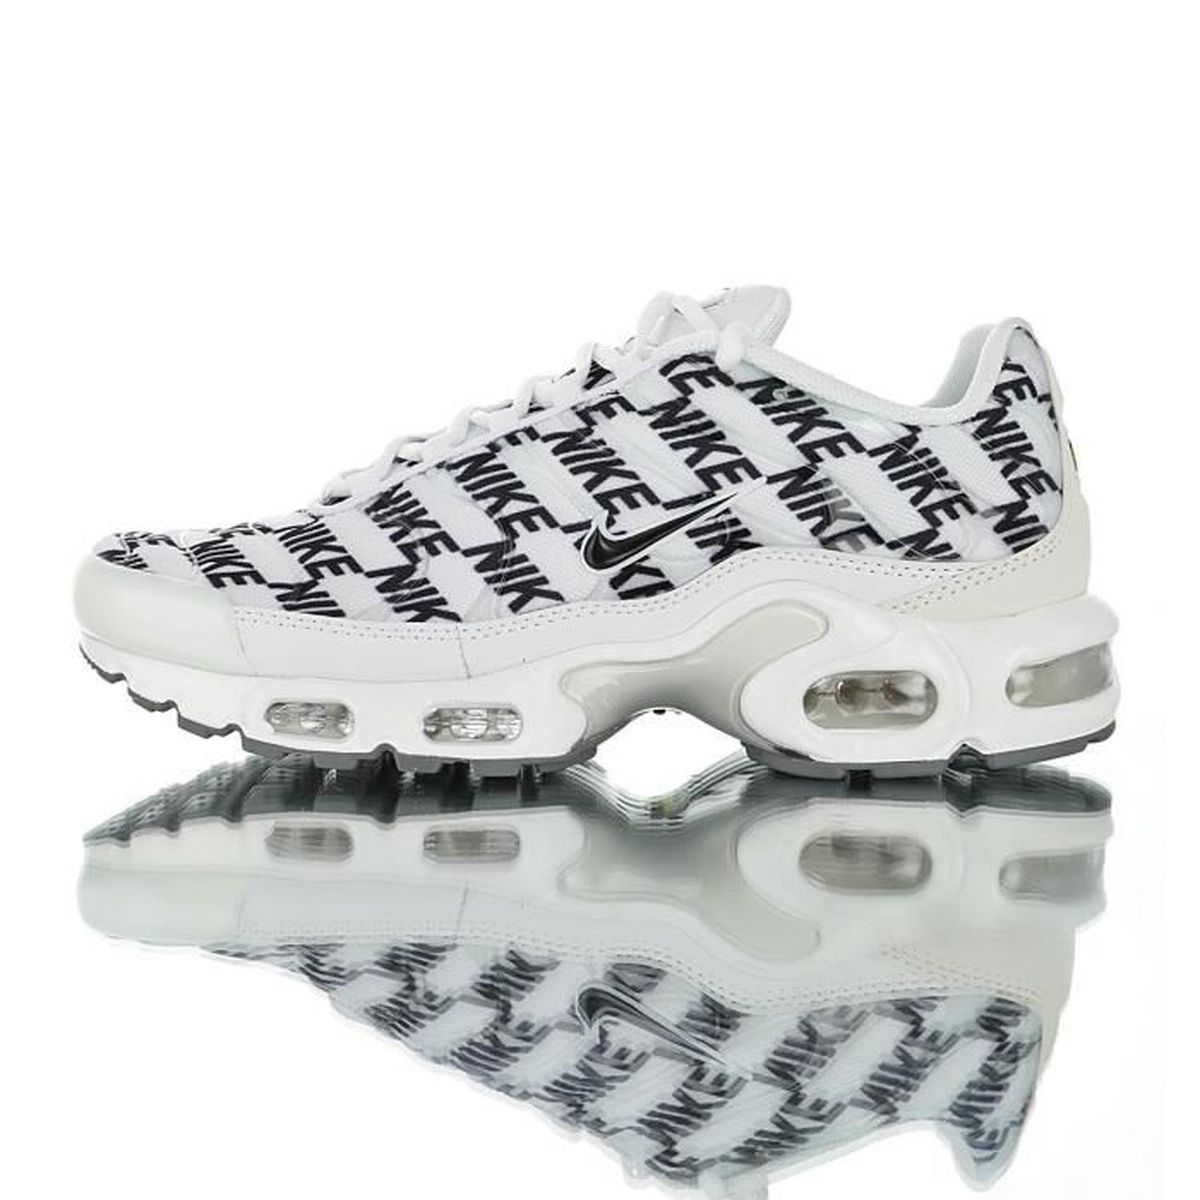 Txt Course Air Max Chaussures Baskets Homme Tn de Nike EHI9eYWD2